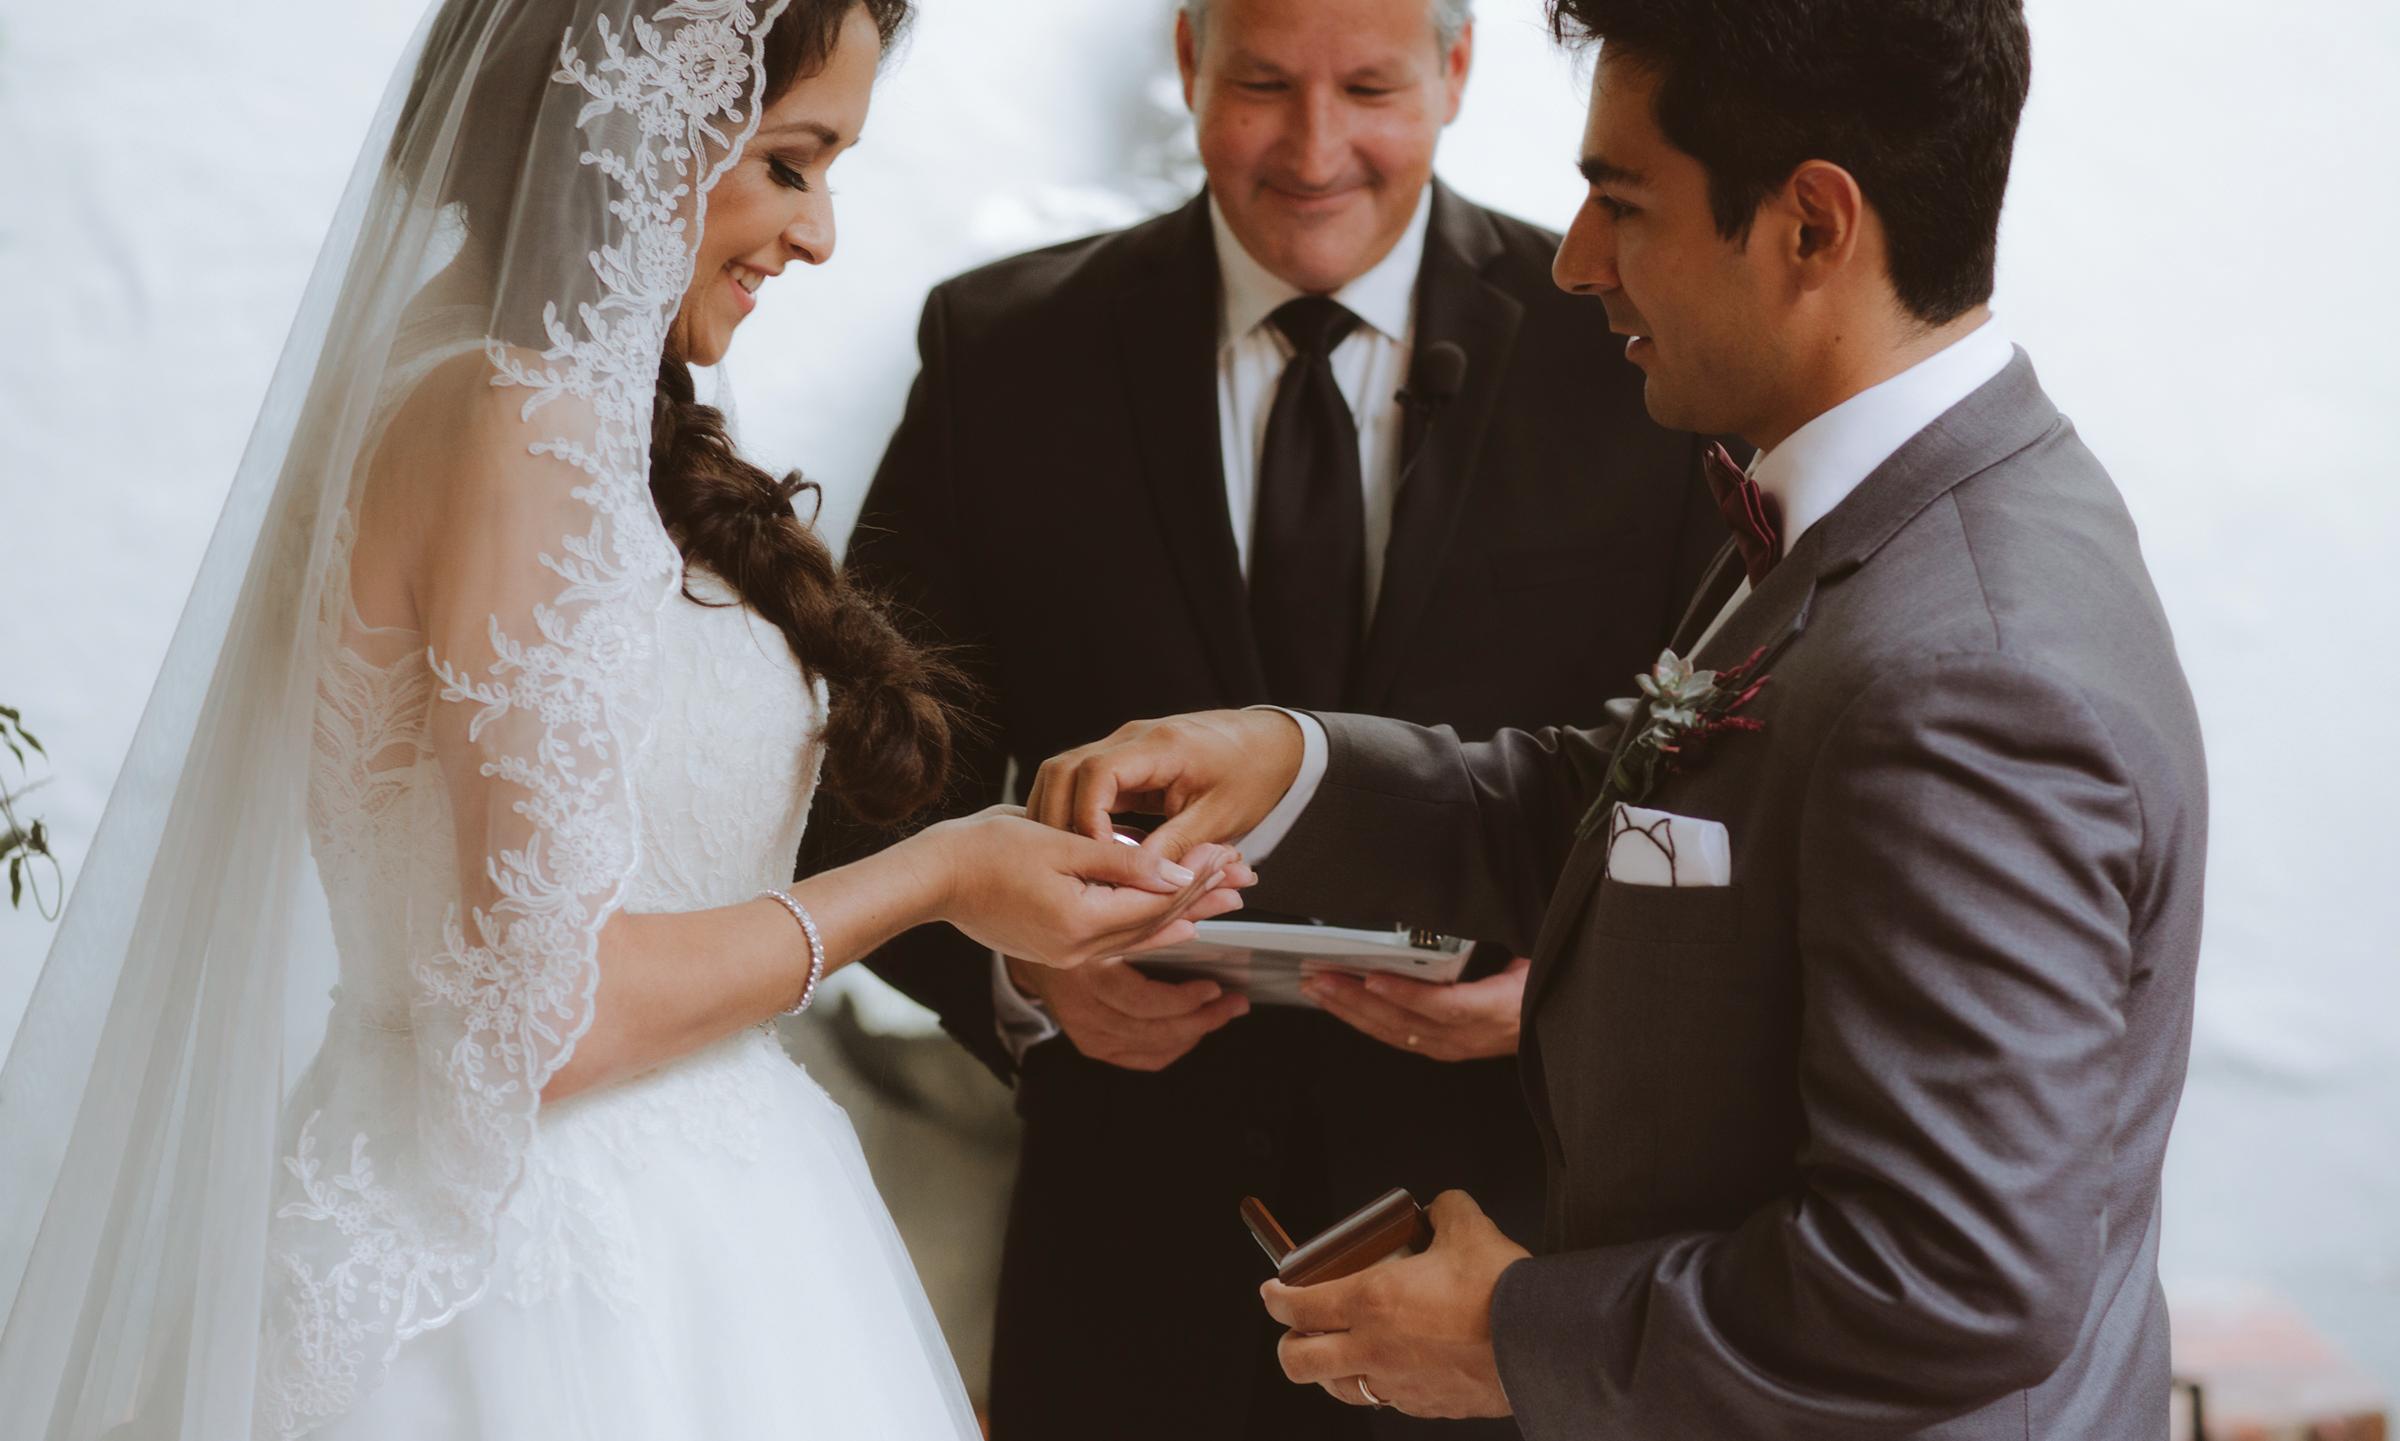 wedding day | MFA St Pete | Vanessa Boy Photography | vanessaboy.com-370.com |final.jpg